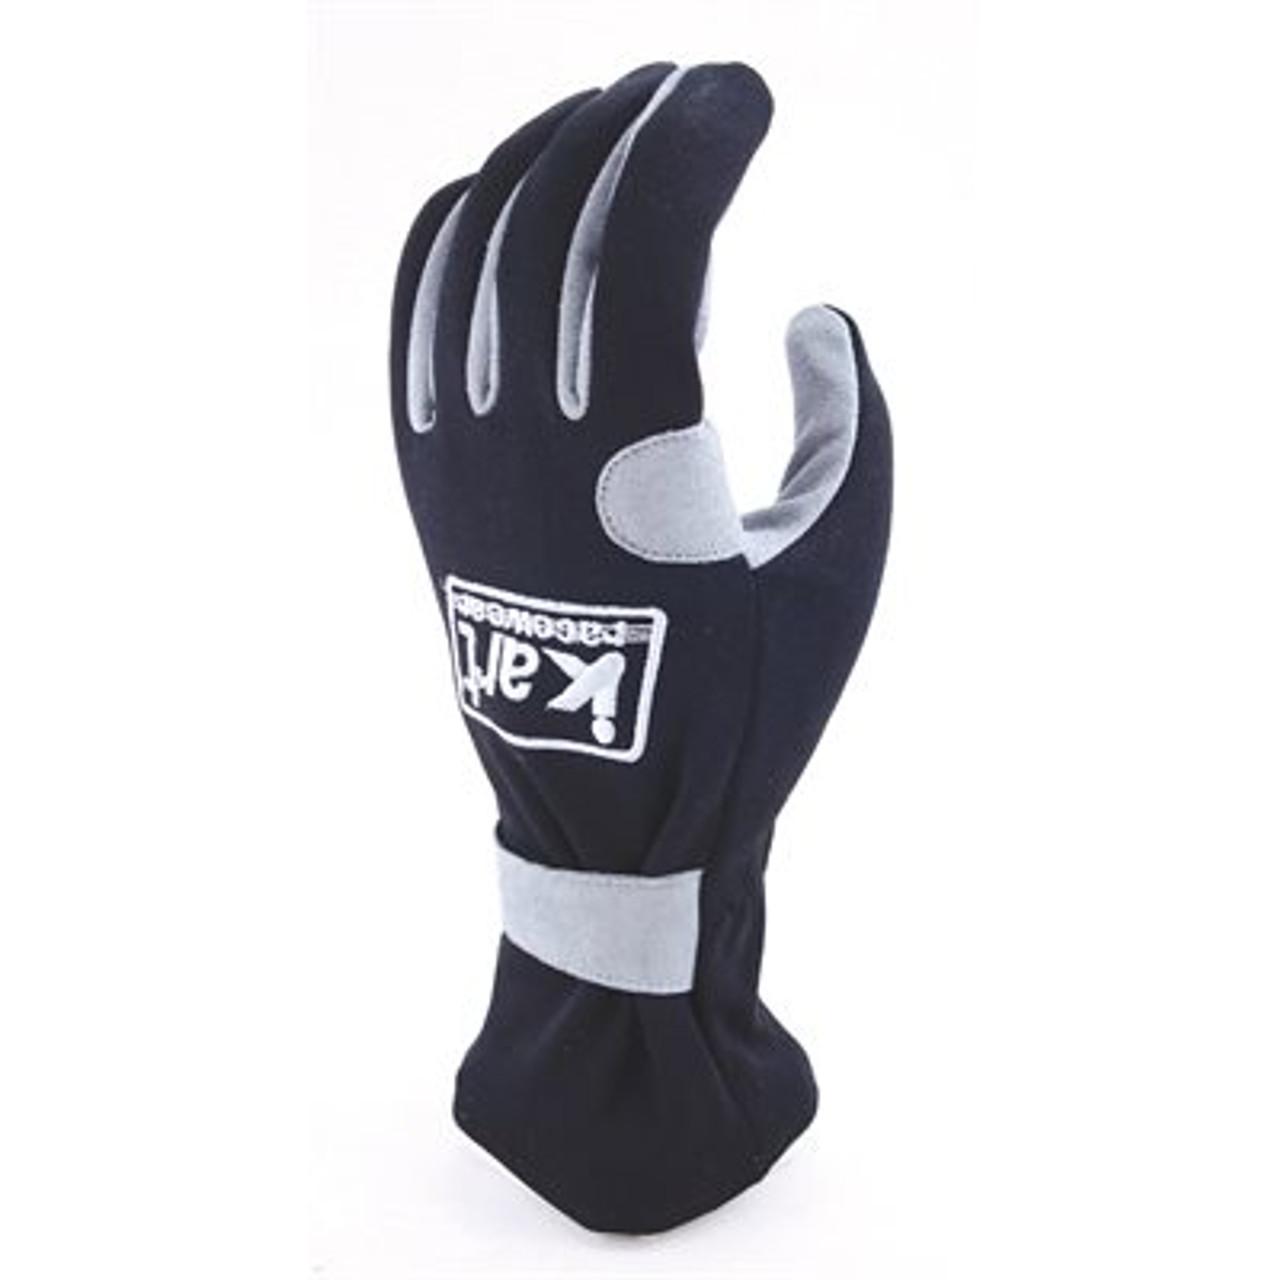 Kart Racewear 200 Series glove (medium)